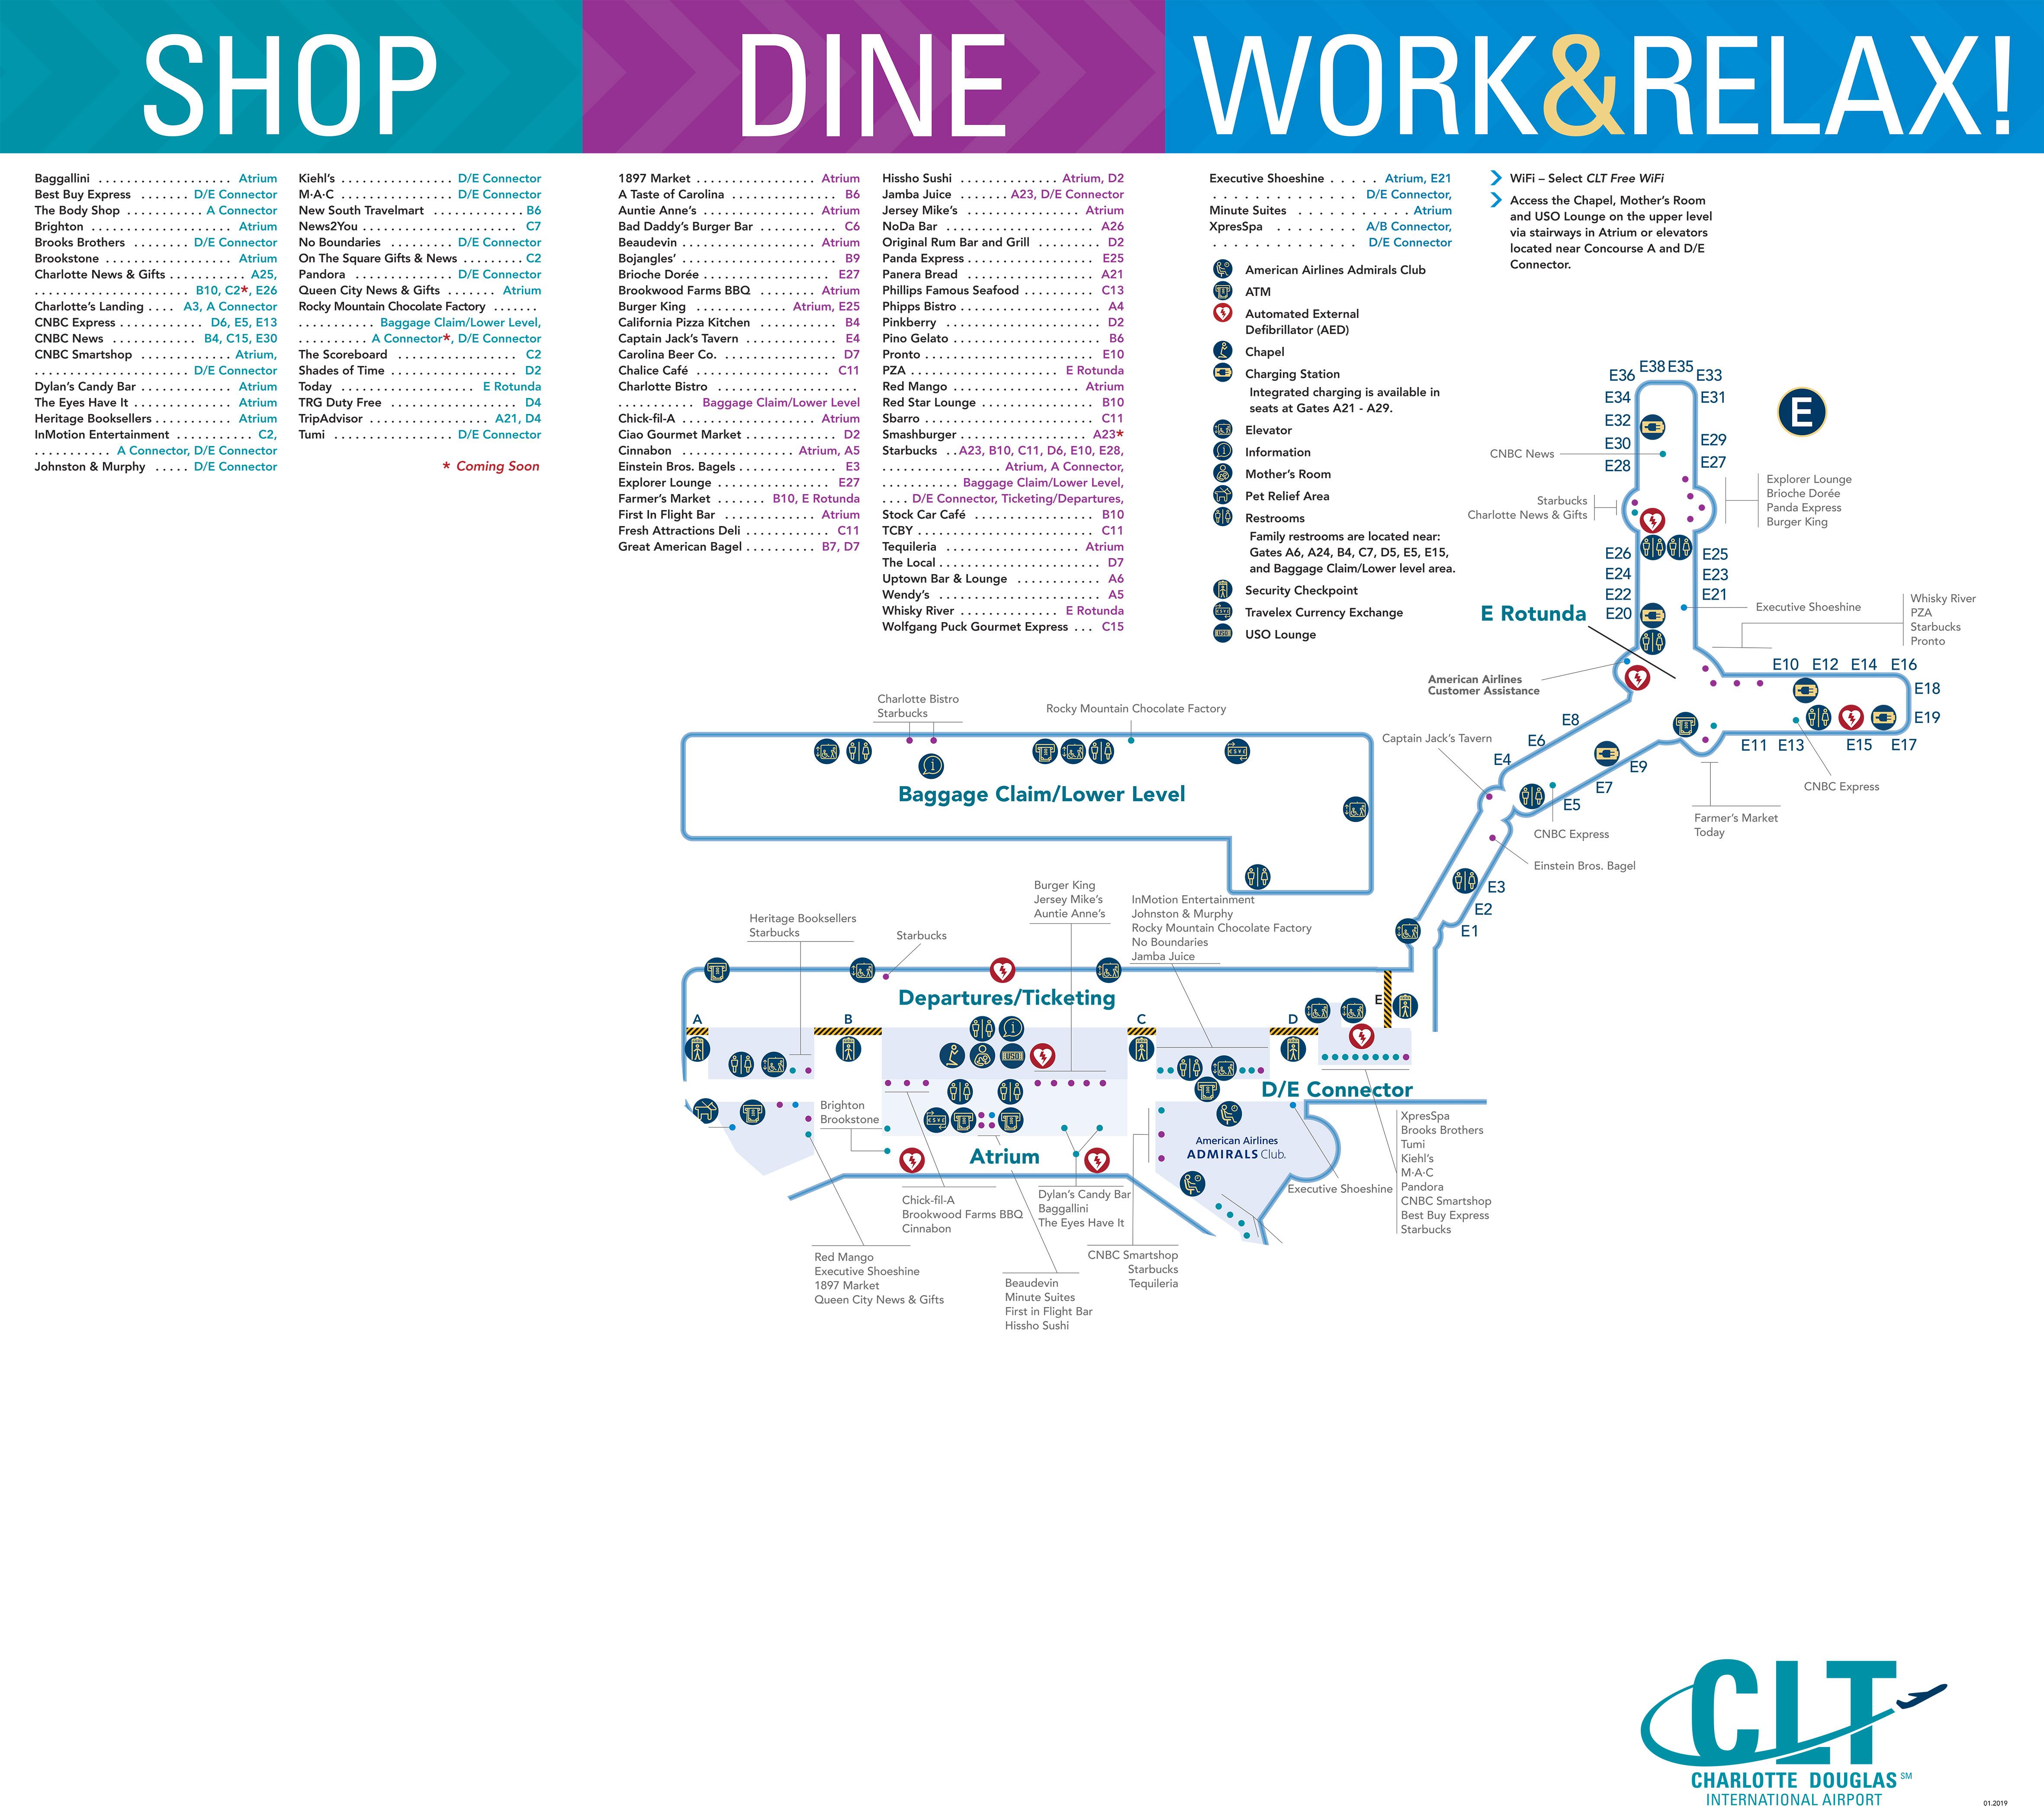 charlotte douglas airport map (clt) - printable terminal